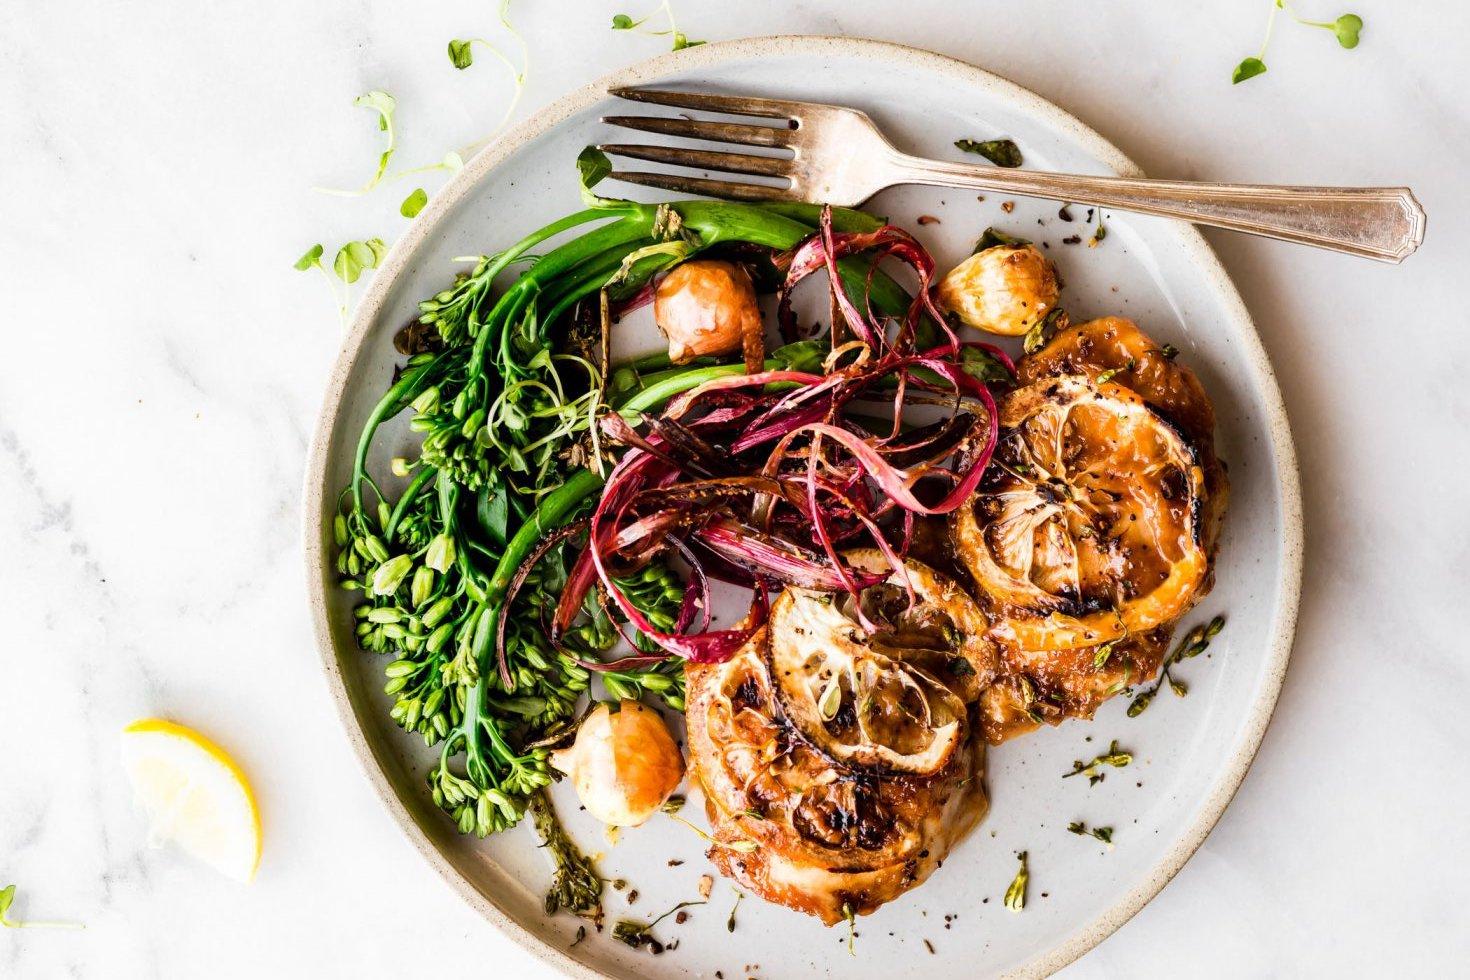 Rhubarb Recipes: 7 Recipes to Make While Its in Season Rhubarb Recipes: 7 Recipes to Make While Its in Season new pics